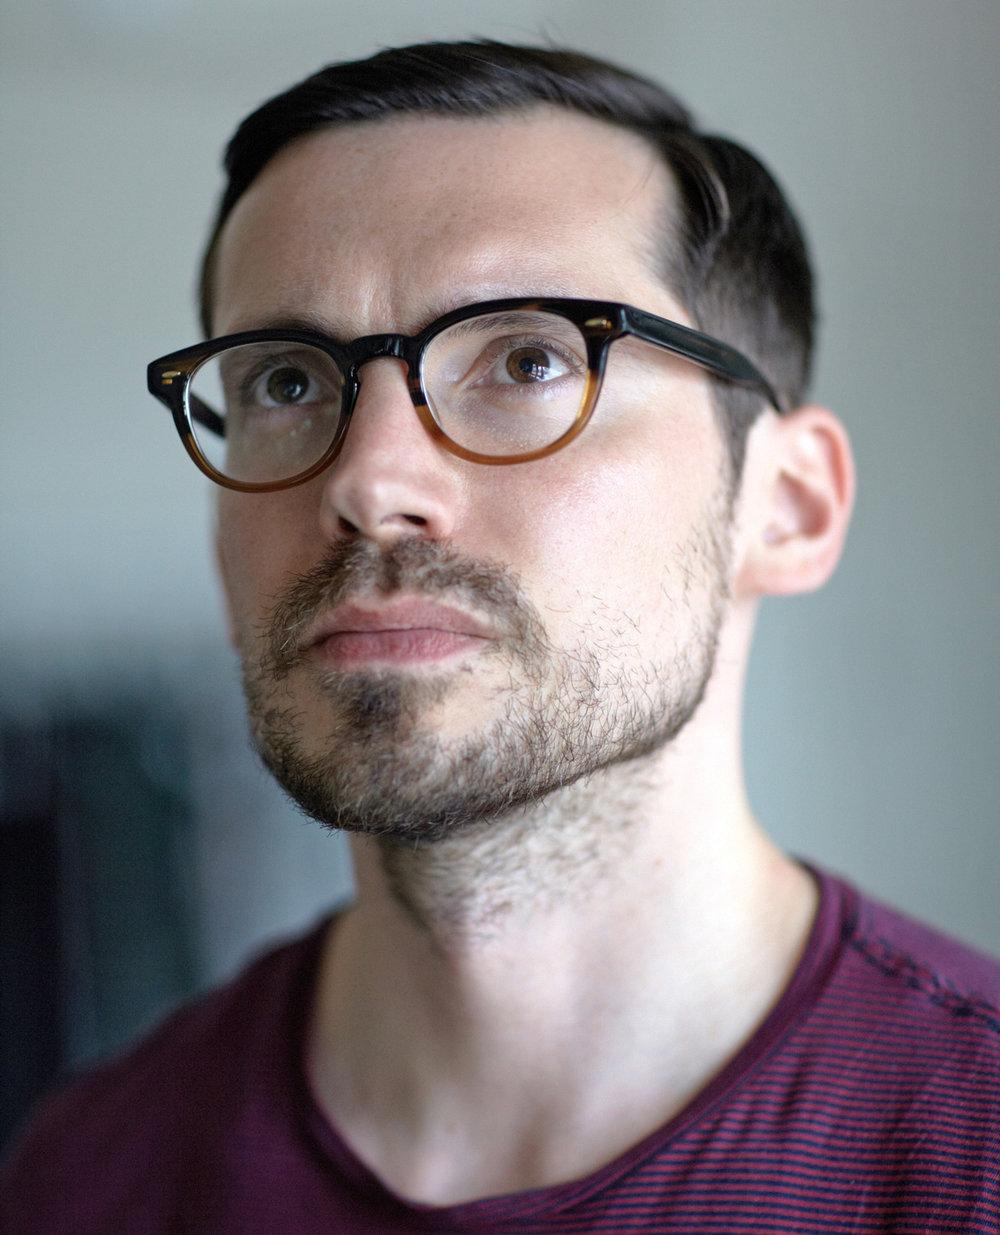 ERDEM  Fashion Designer at his studio in London, England for Whitewall Magazine